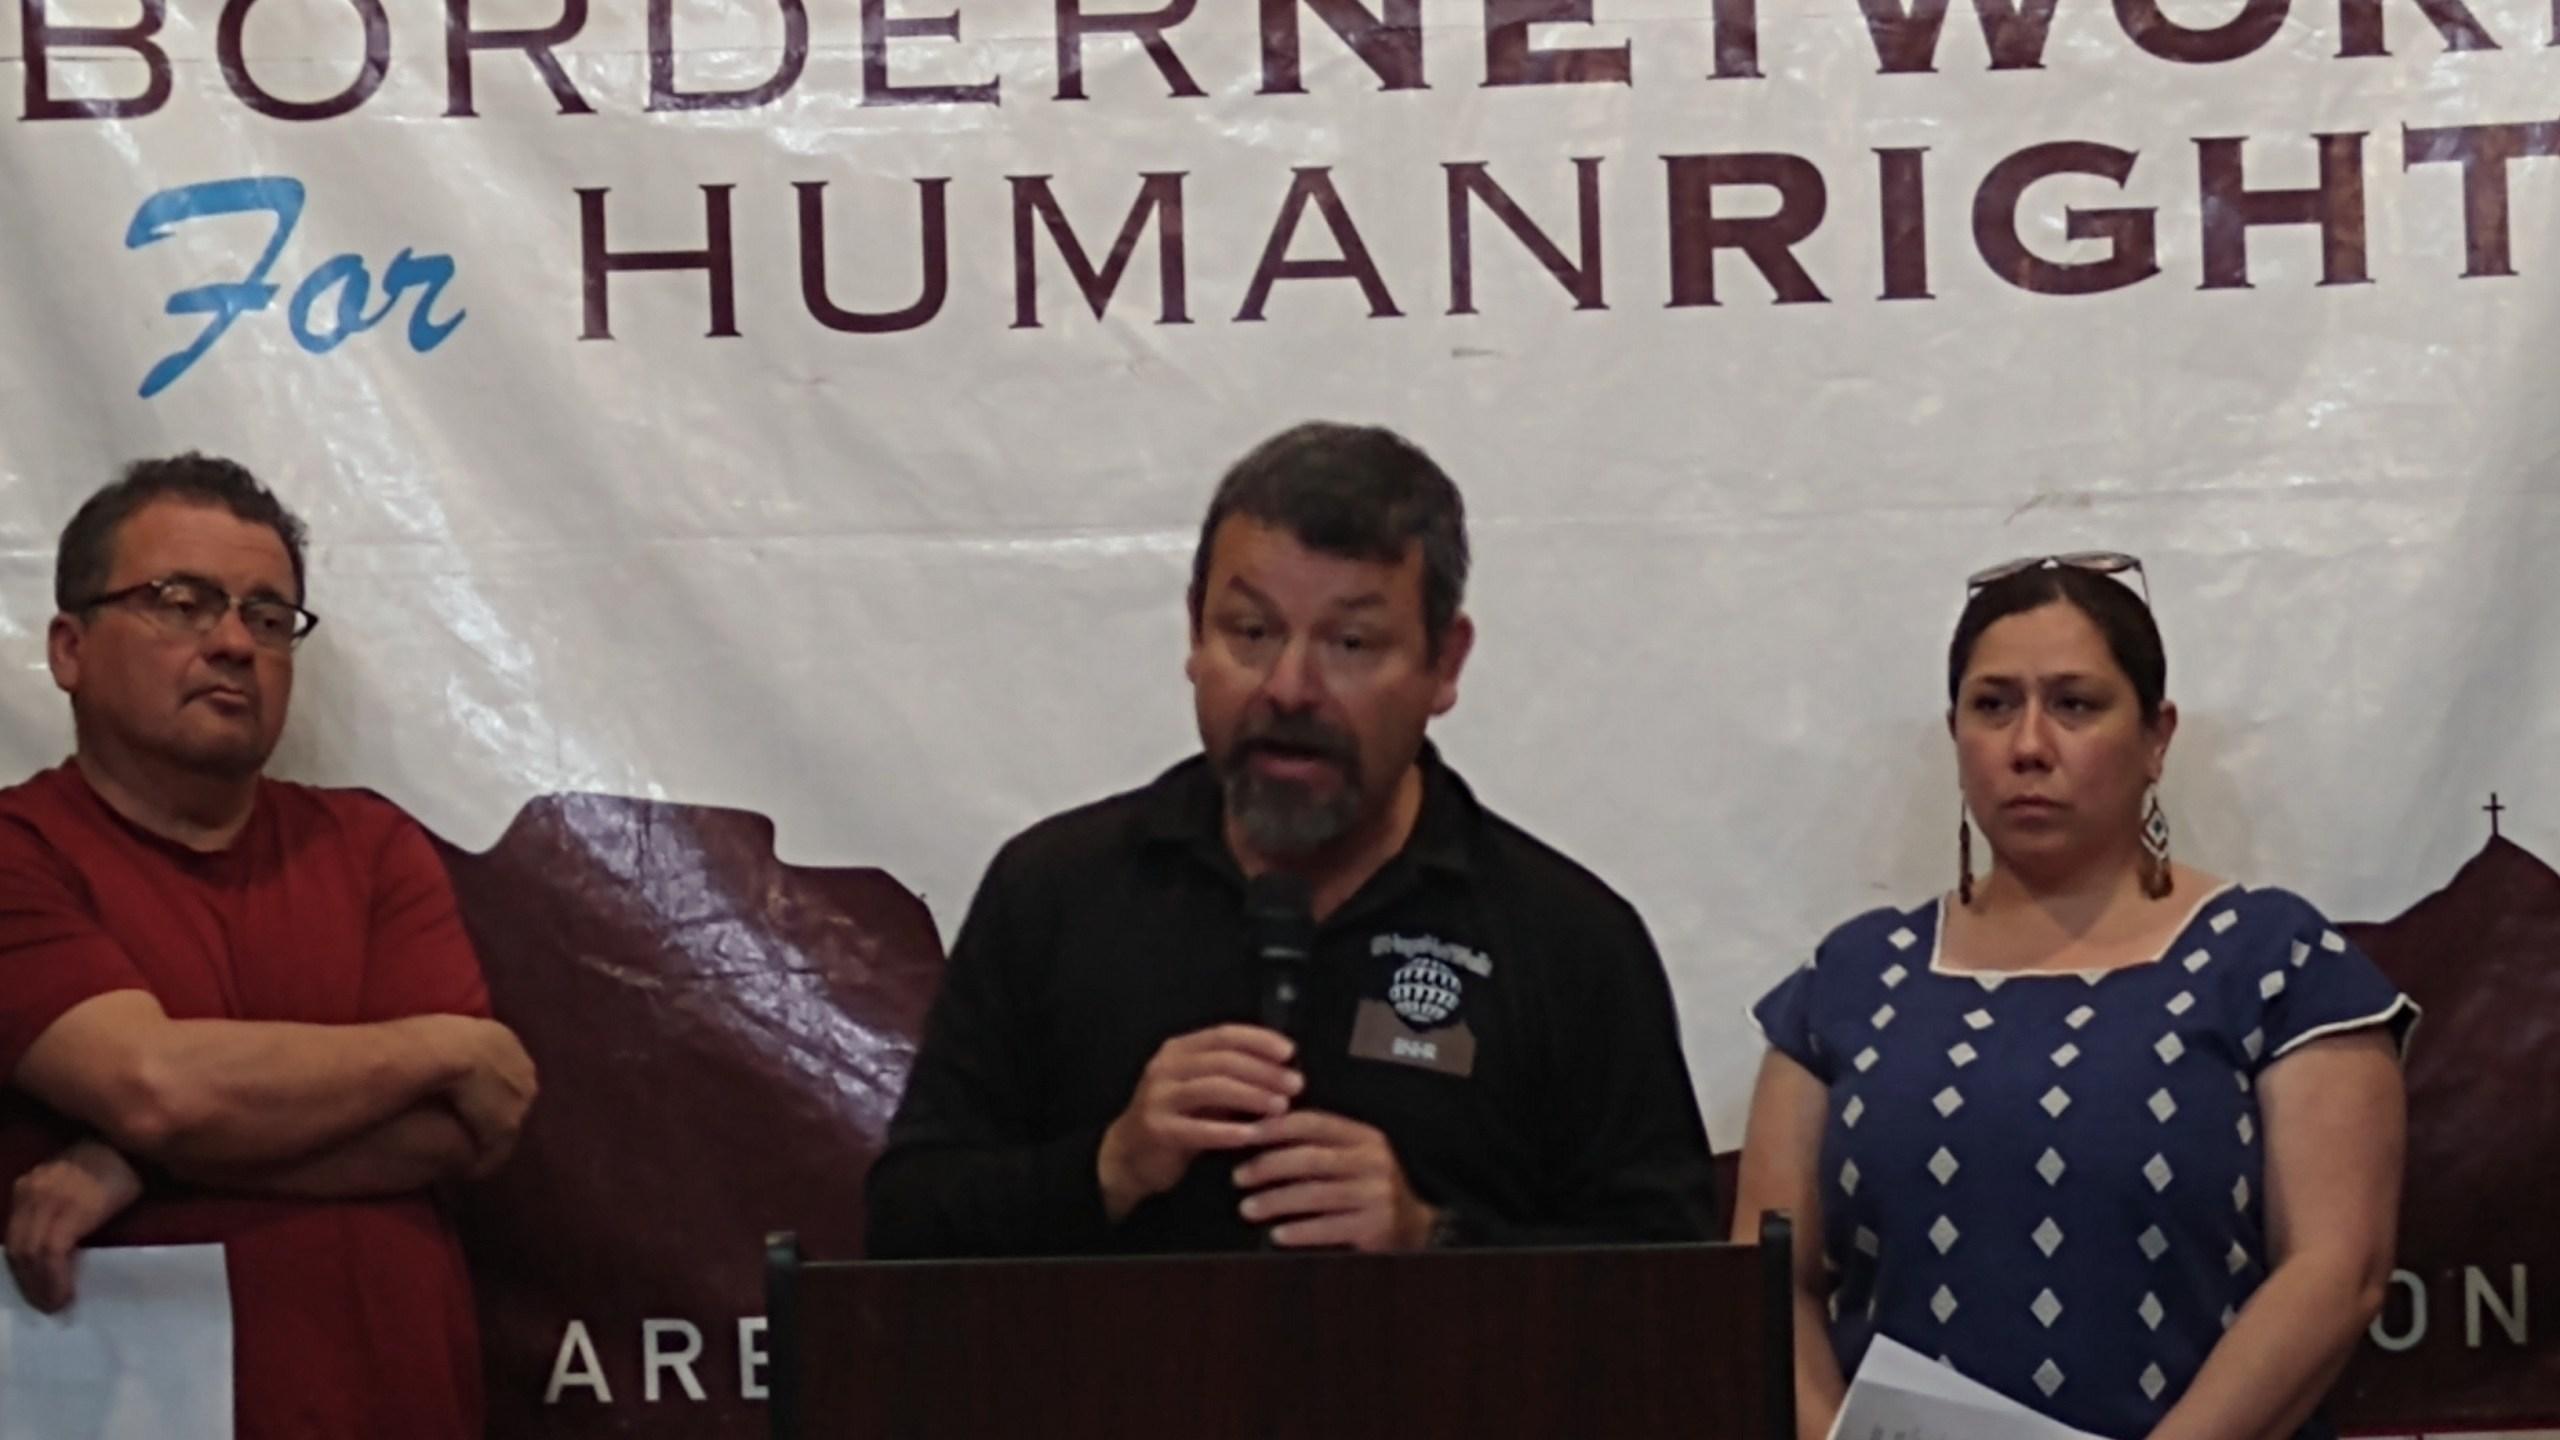 Fernando Garcia (center), executive director of El Paso's Border Network for Human Rights